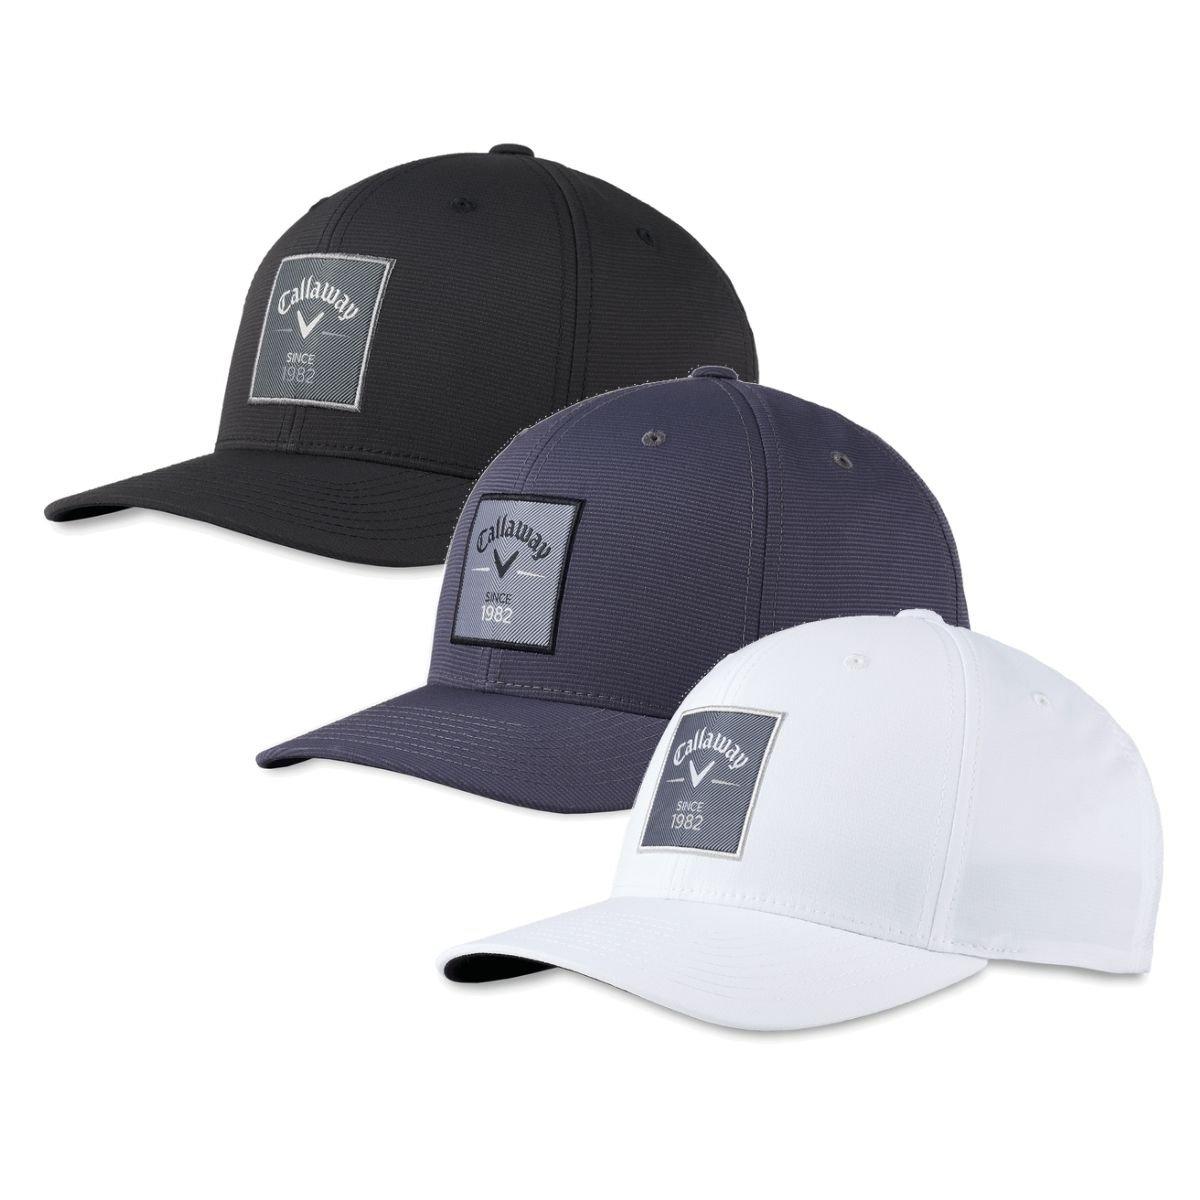 Callaway 2021 Rutherford Flexfit Snapback Hat